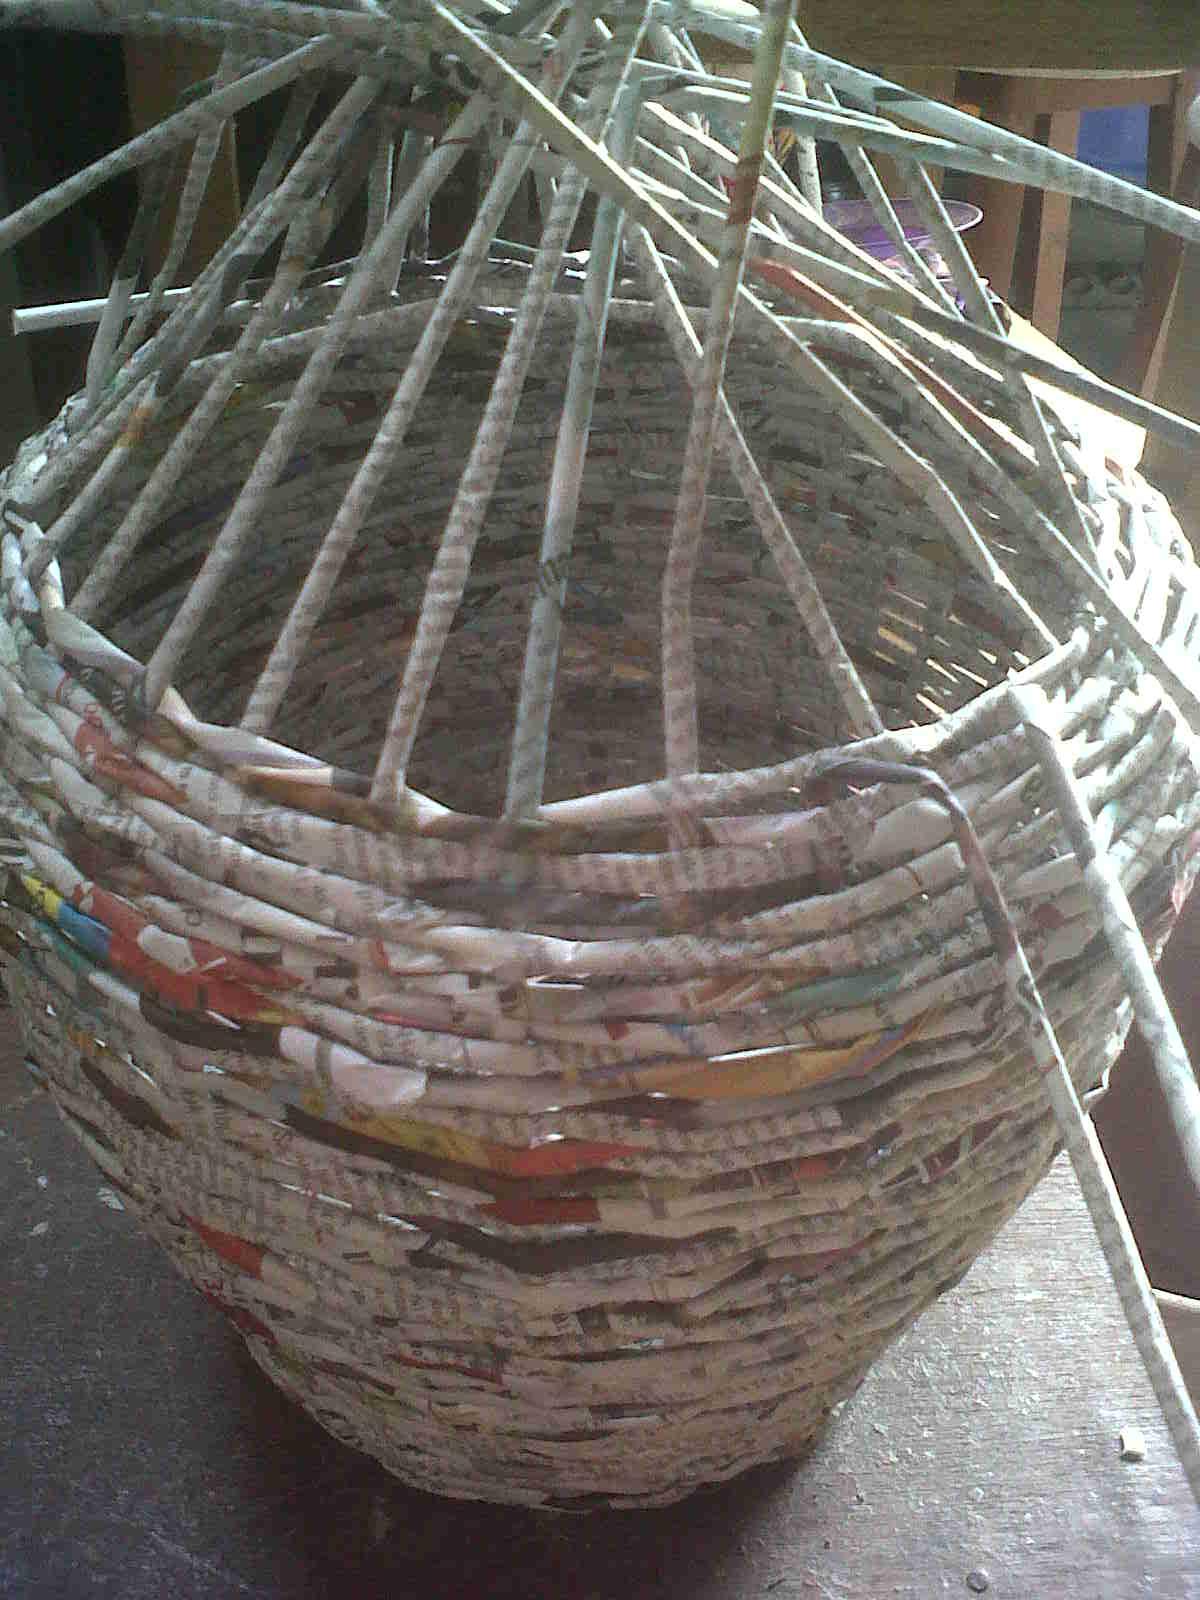 kerajinan tangan dari barang bekas, daur ulang kertas